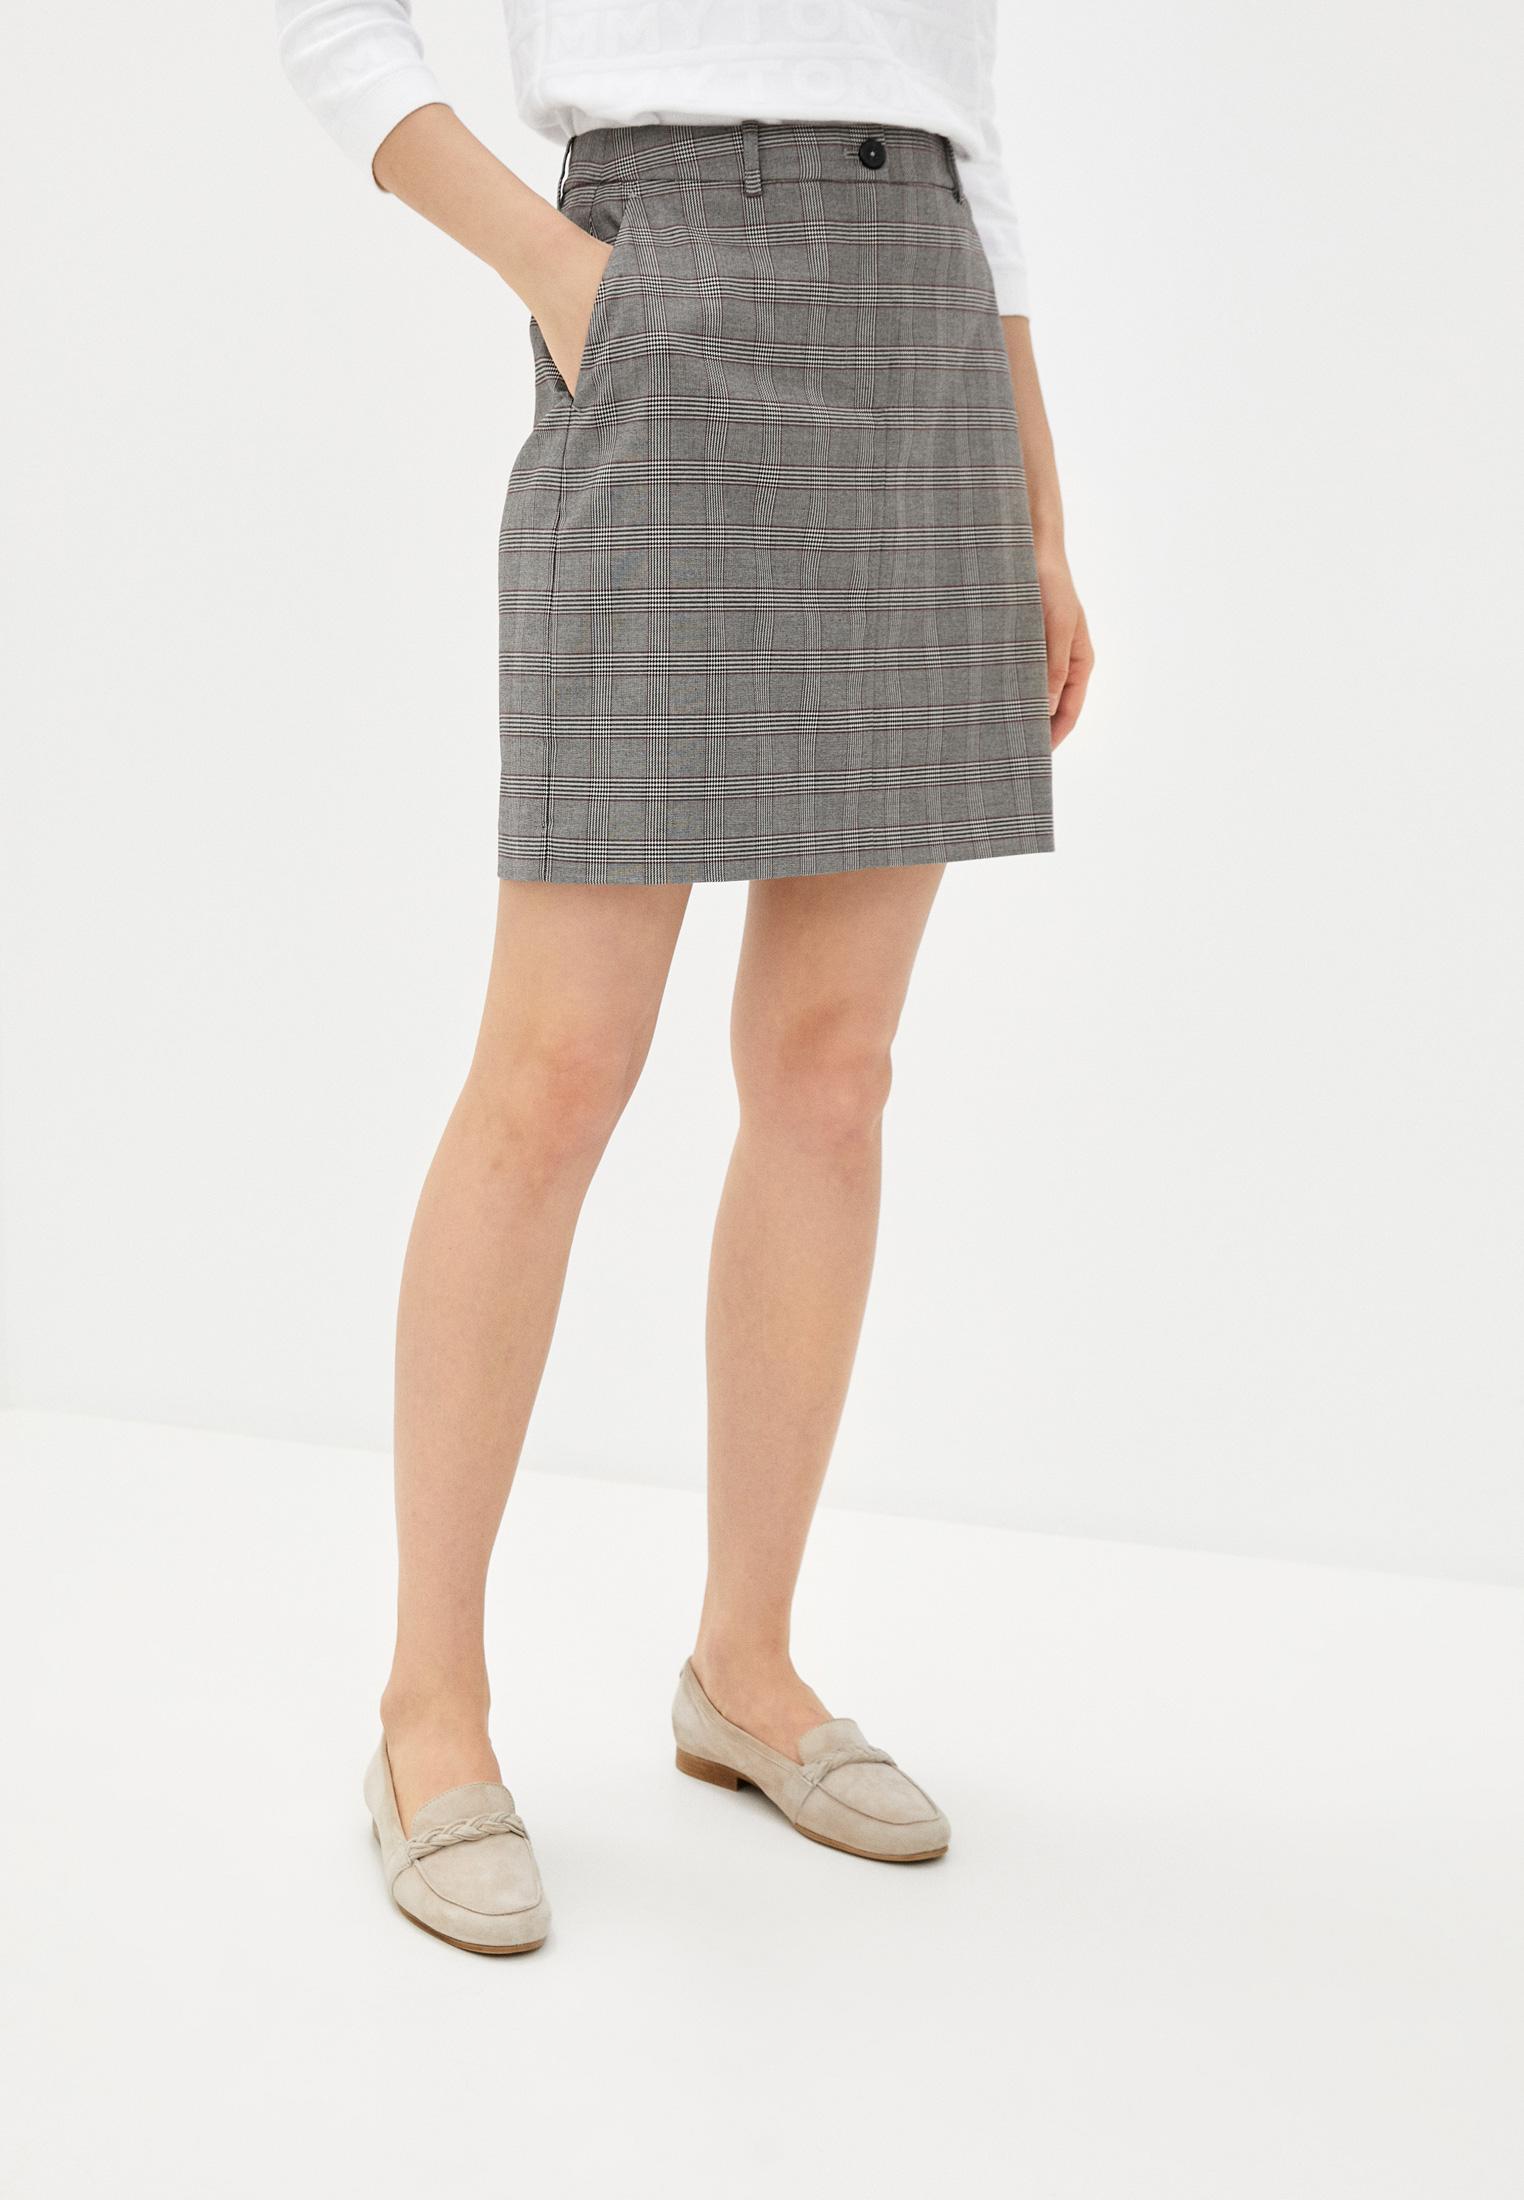 Прямая юбка Tommy Hilfiger (Томми Хилфигер) WW0WW28195